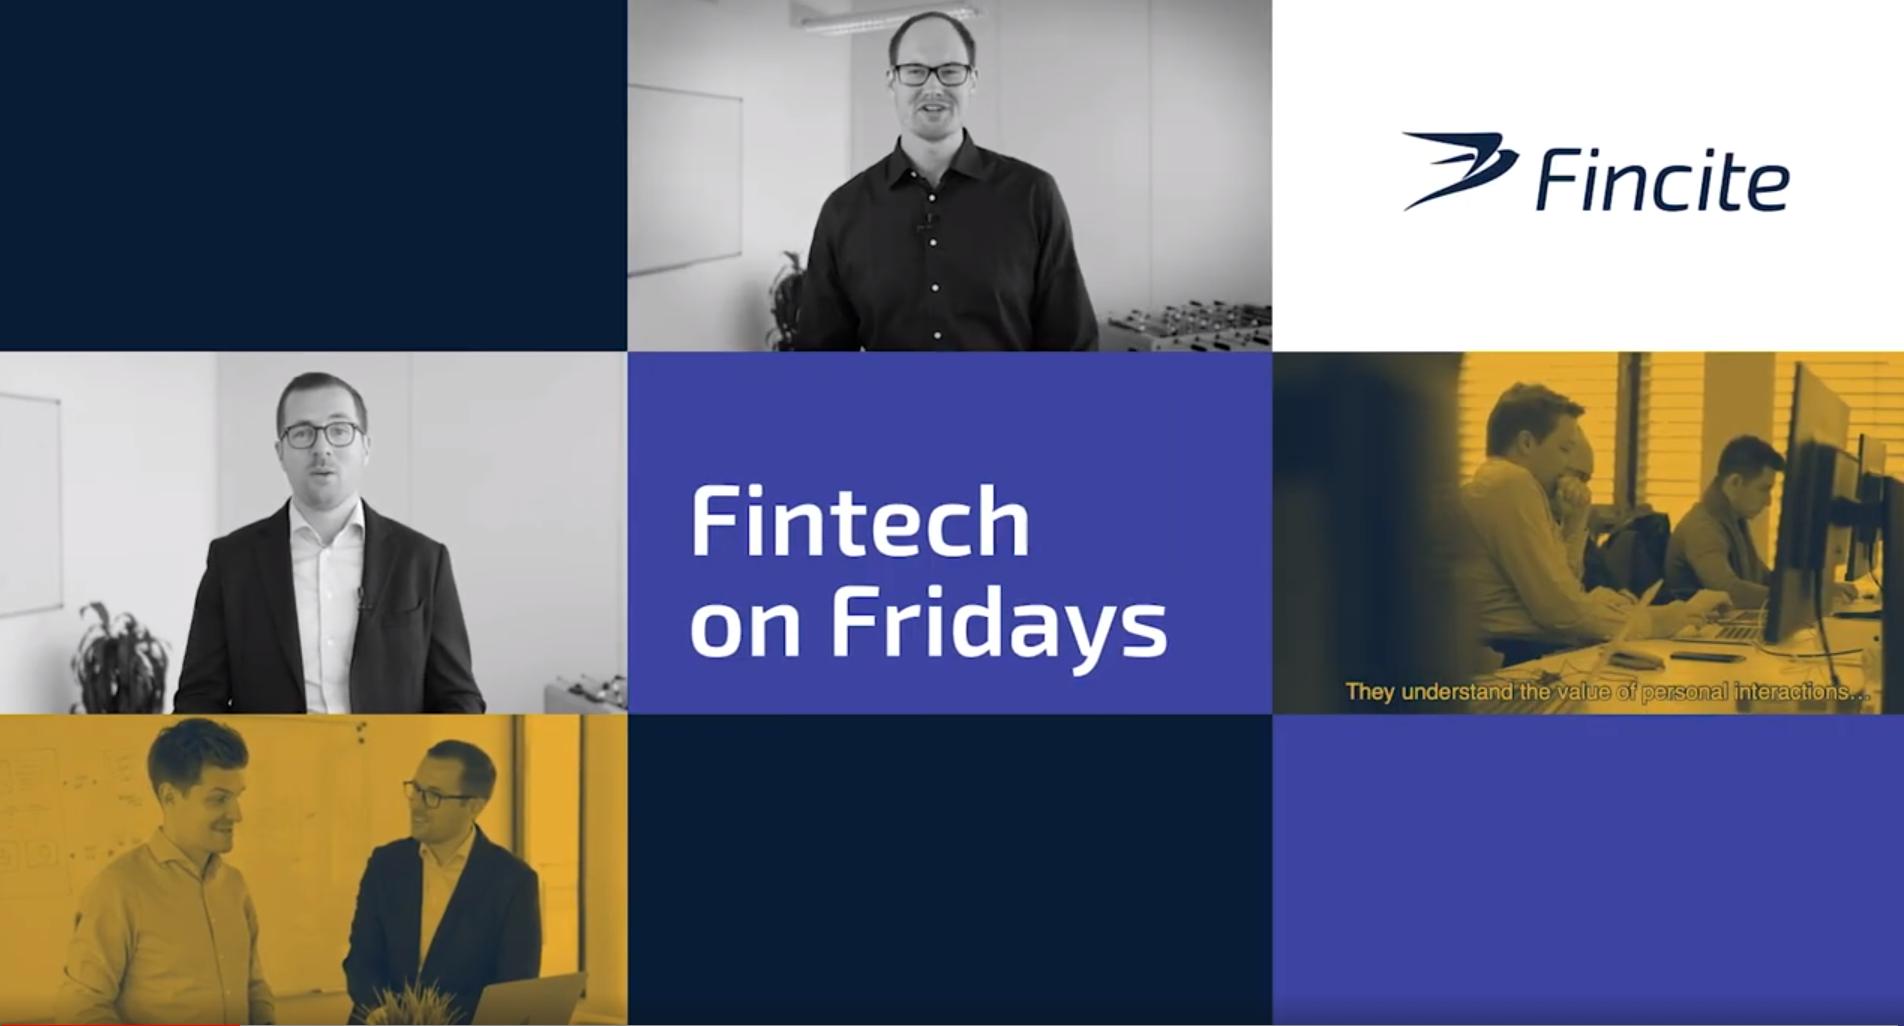 Financial Advice 2.0: Inventing super-human advisors